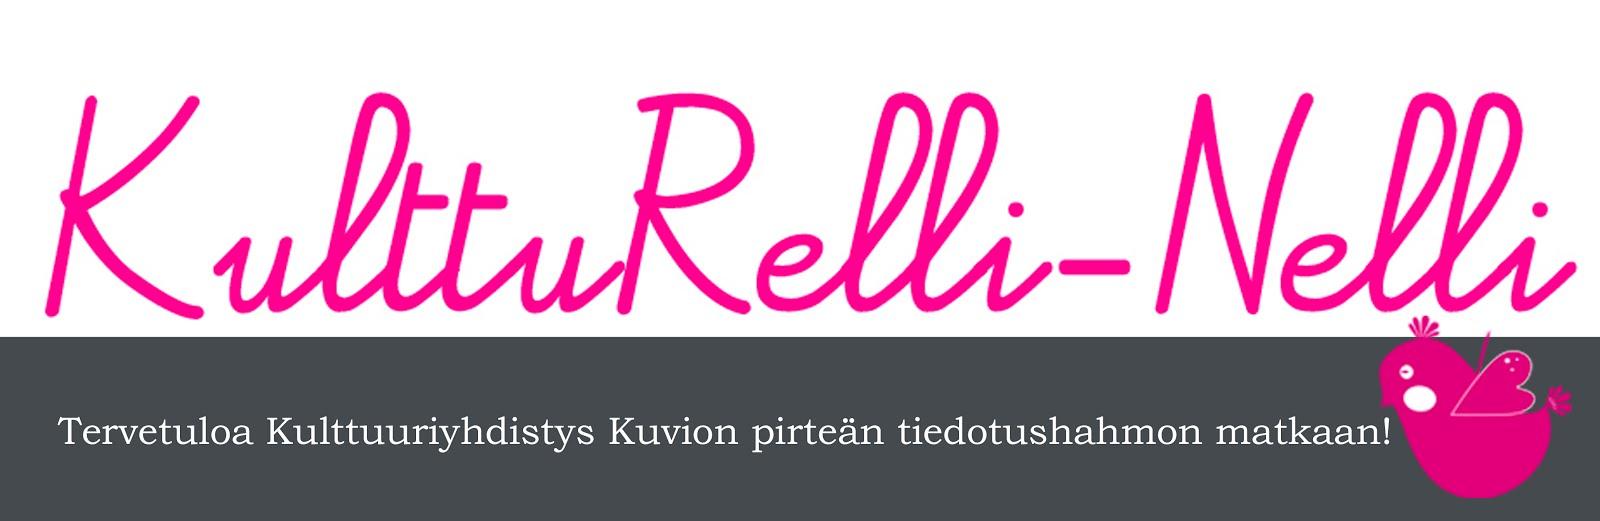 Kultturelli-Nelli